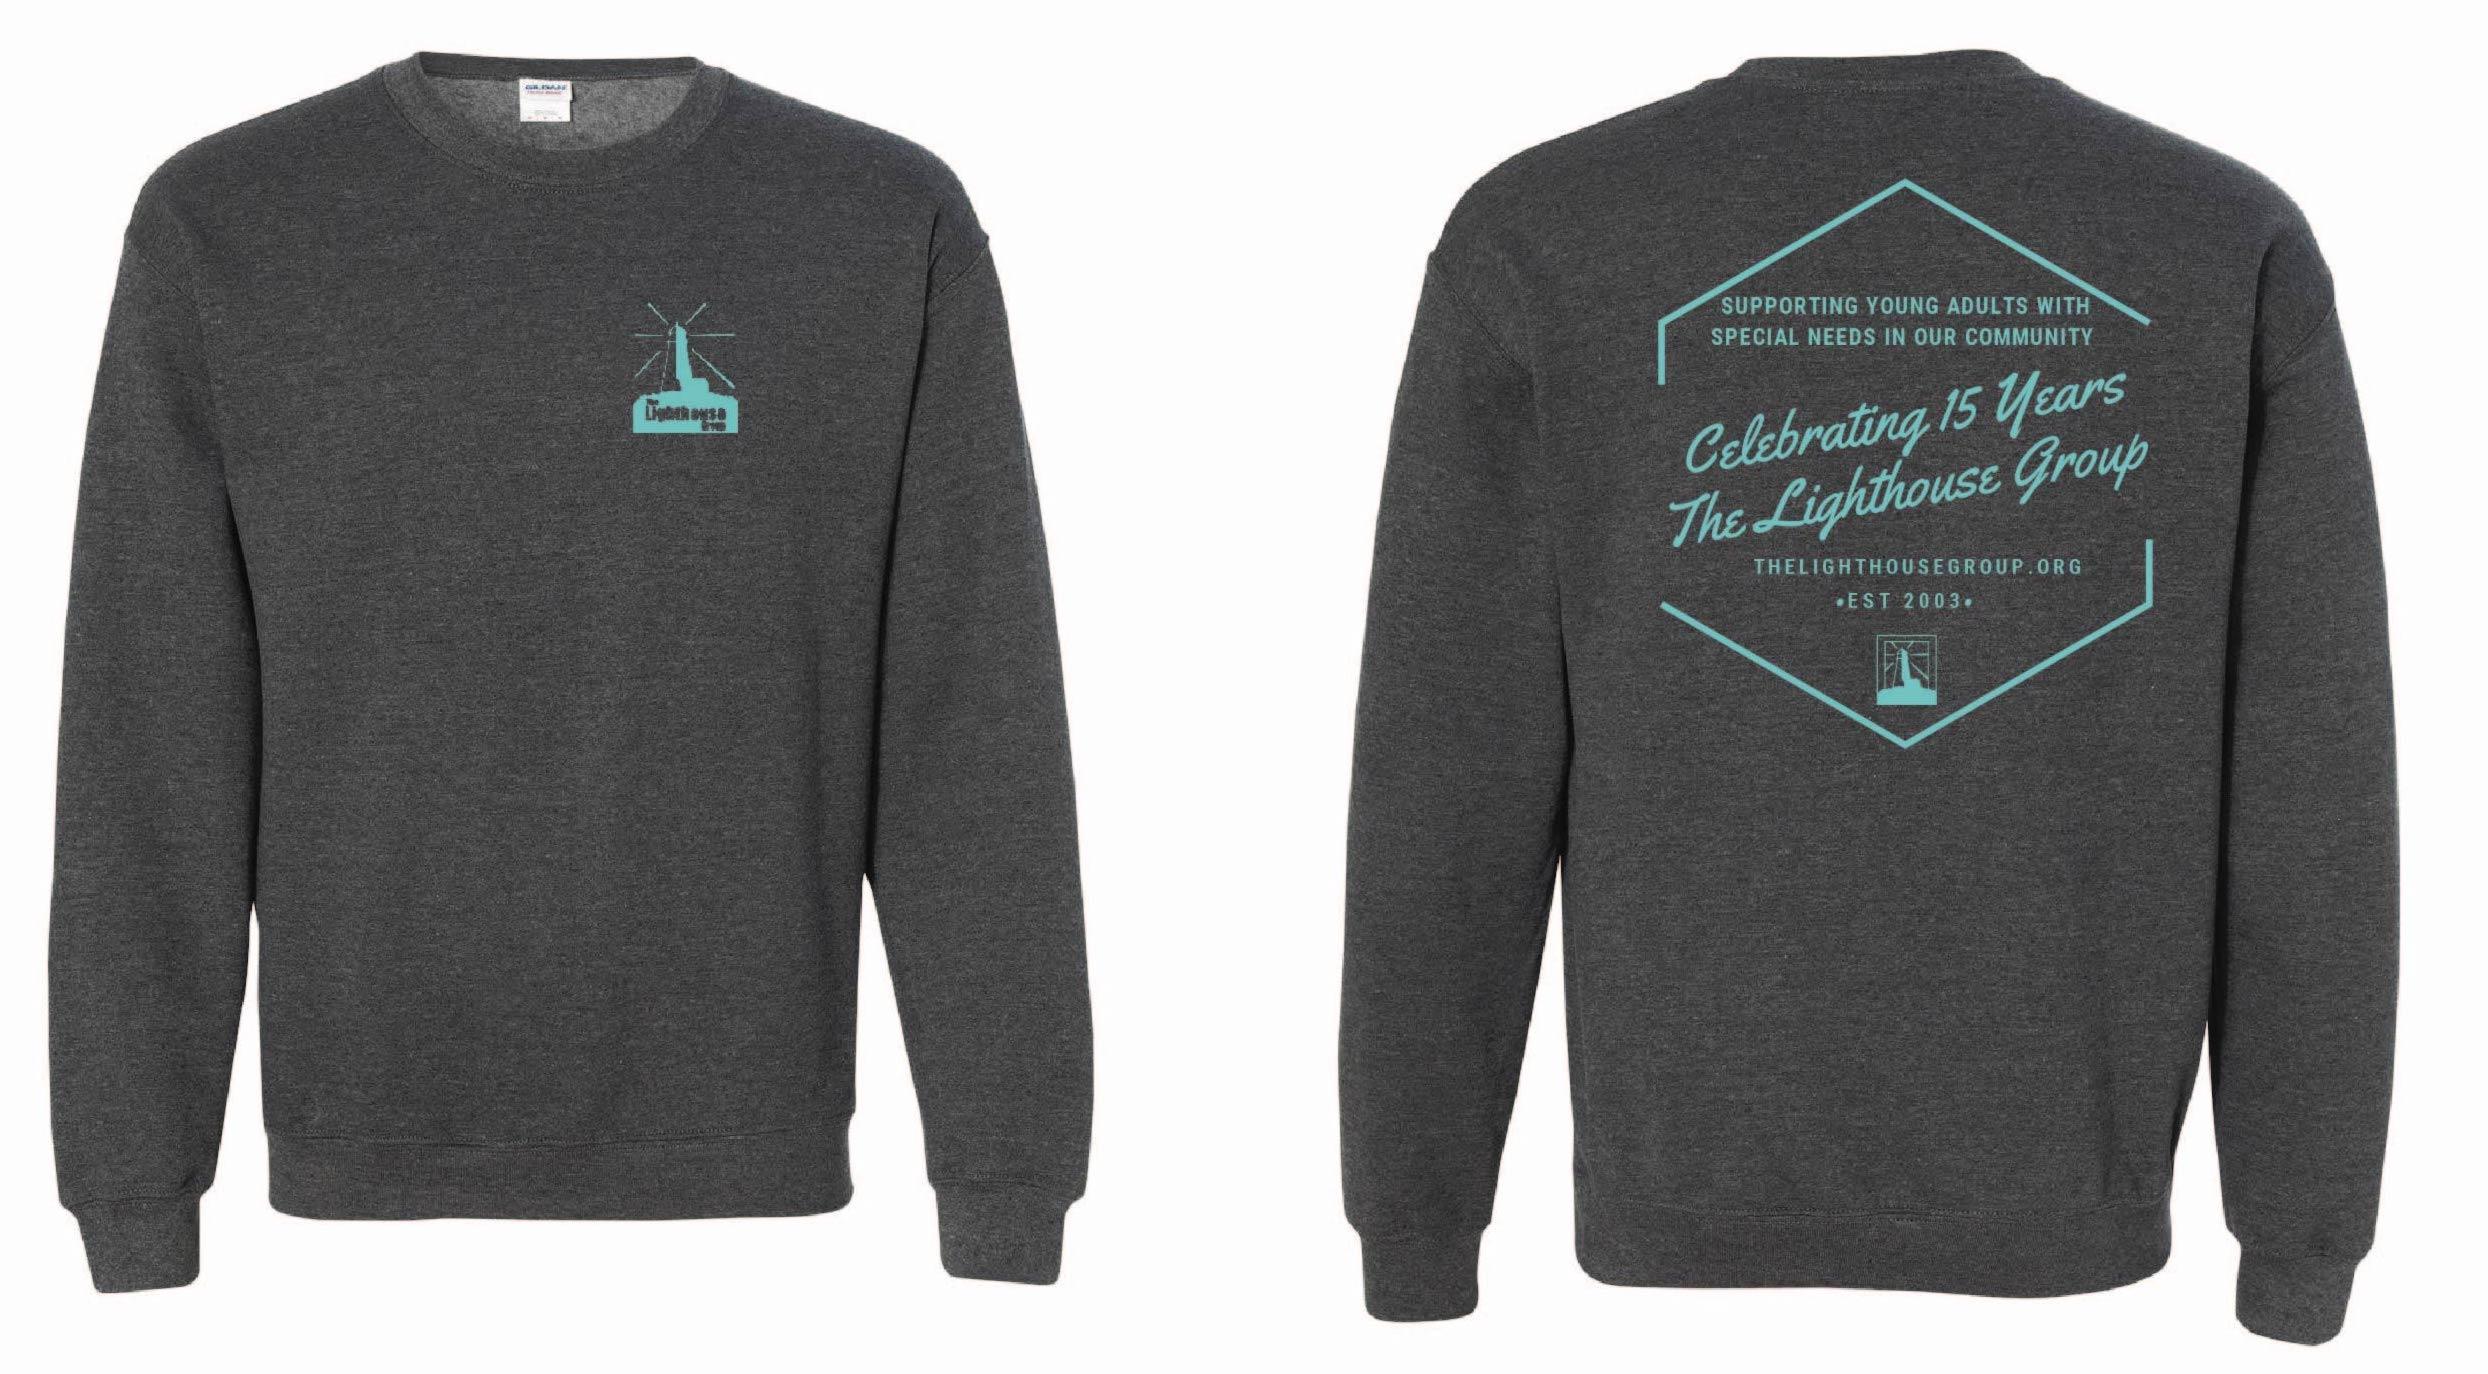 LH 15 year sweatshirts 2.jpg